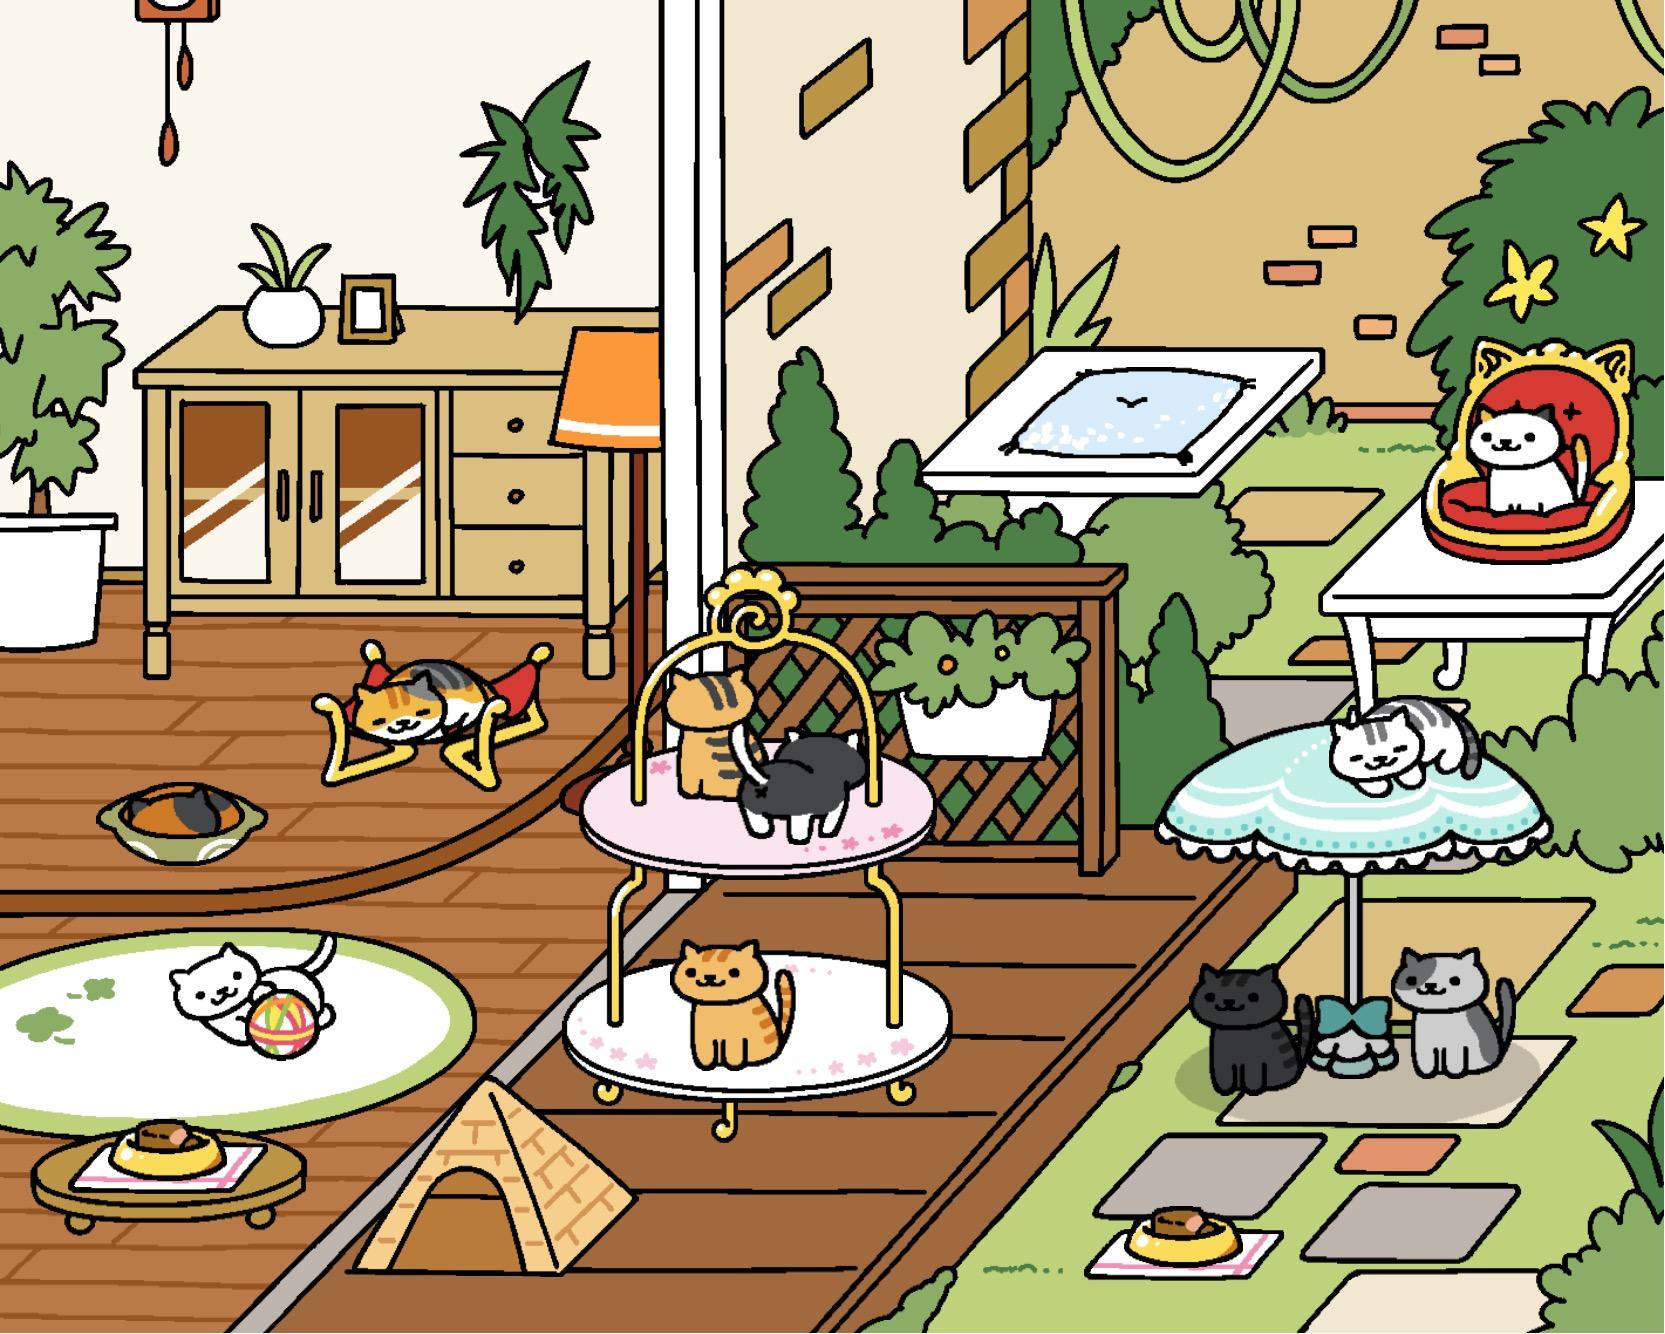 Neko Atsume update: Rustic Style Yard - Original